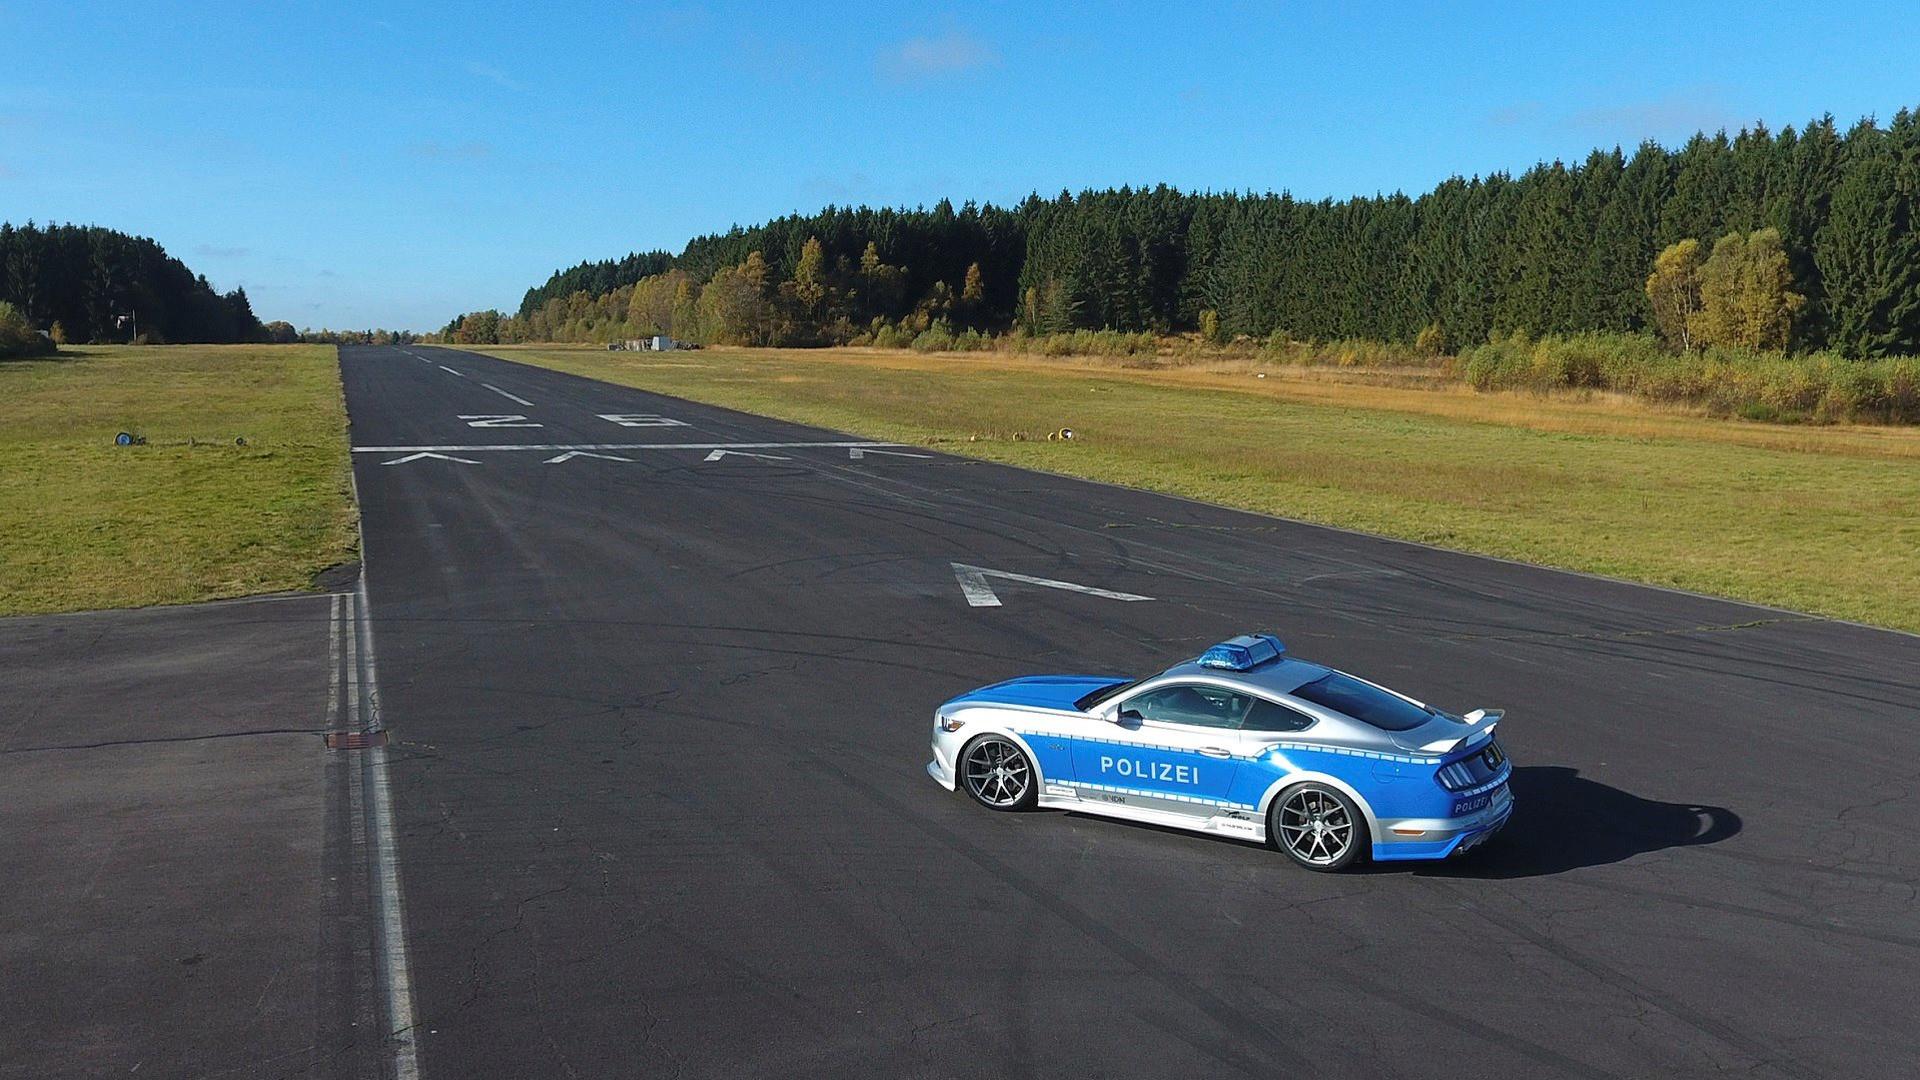 Тюнинг-ателье подготовило Форд Mustang для милиции